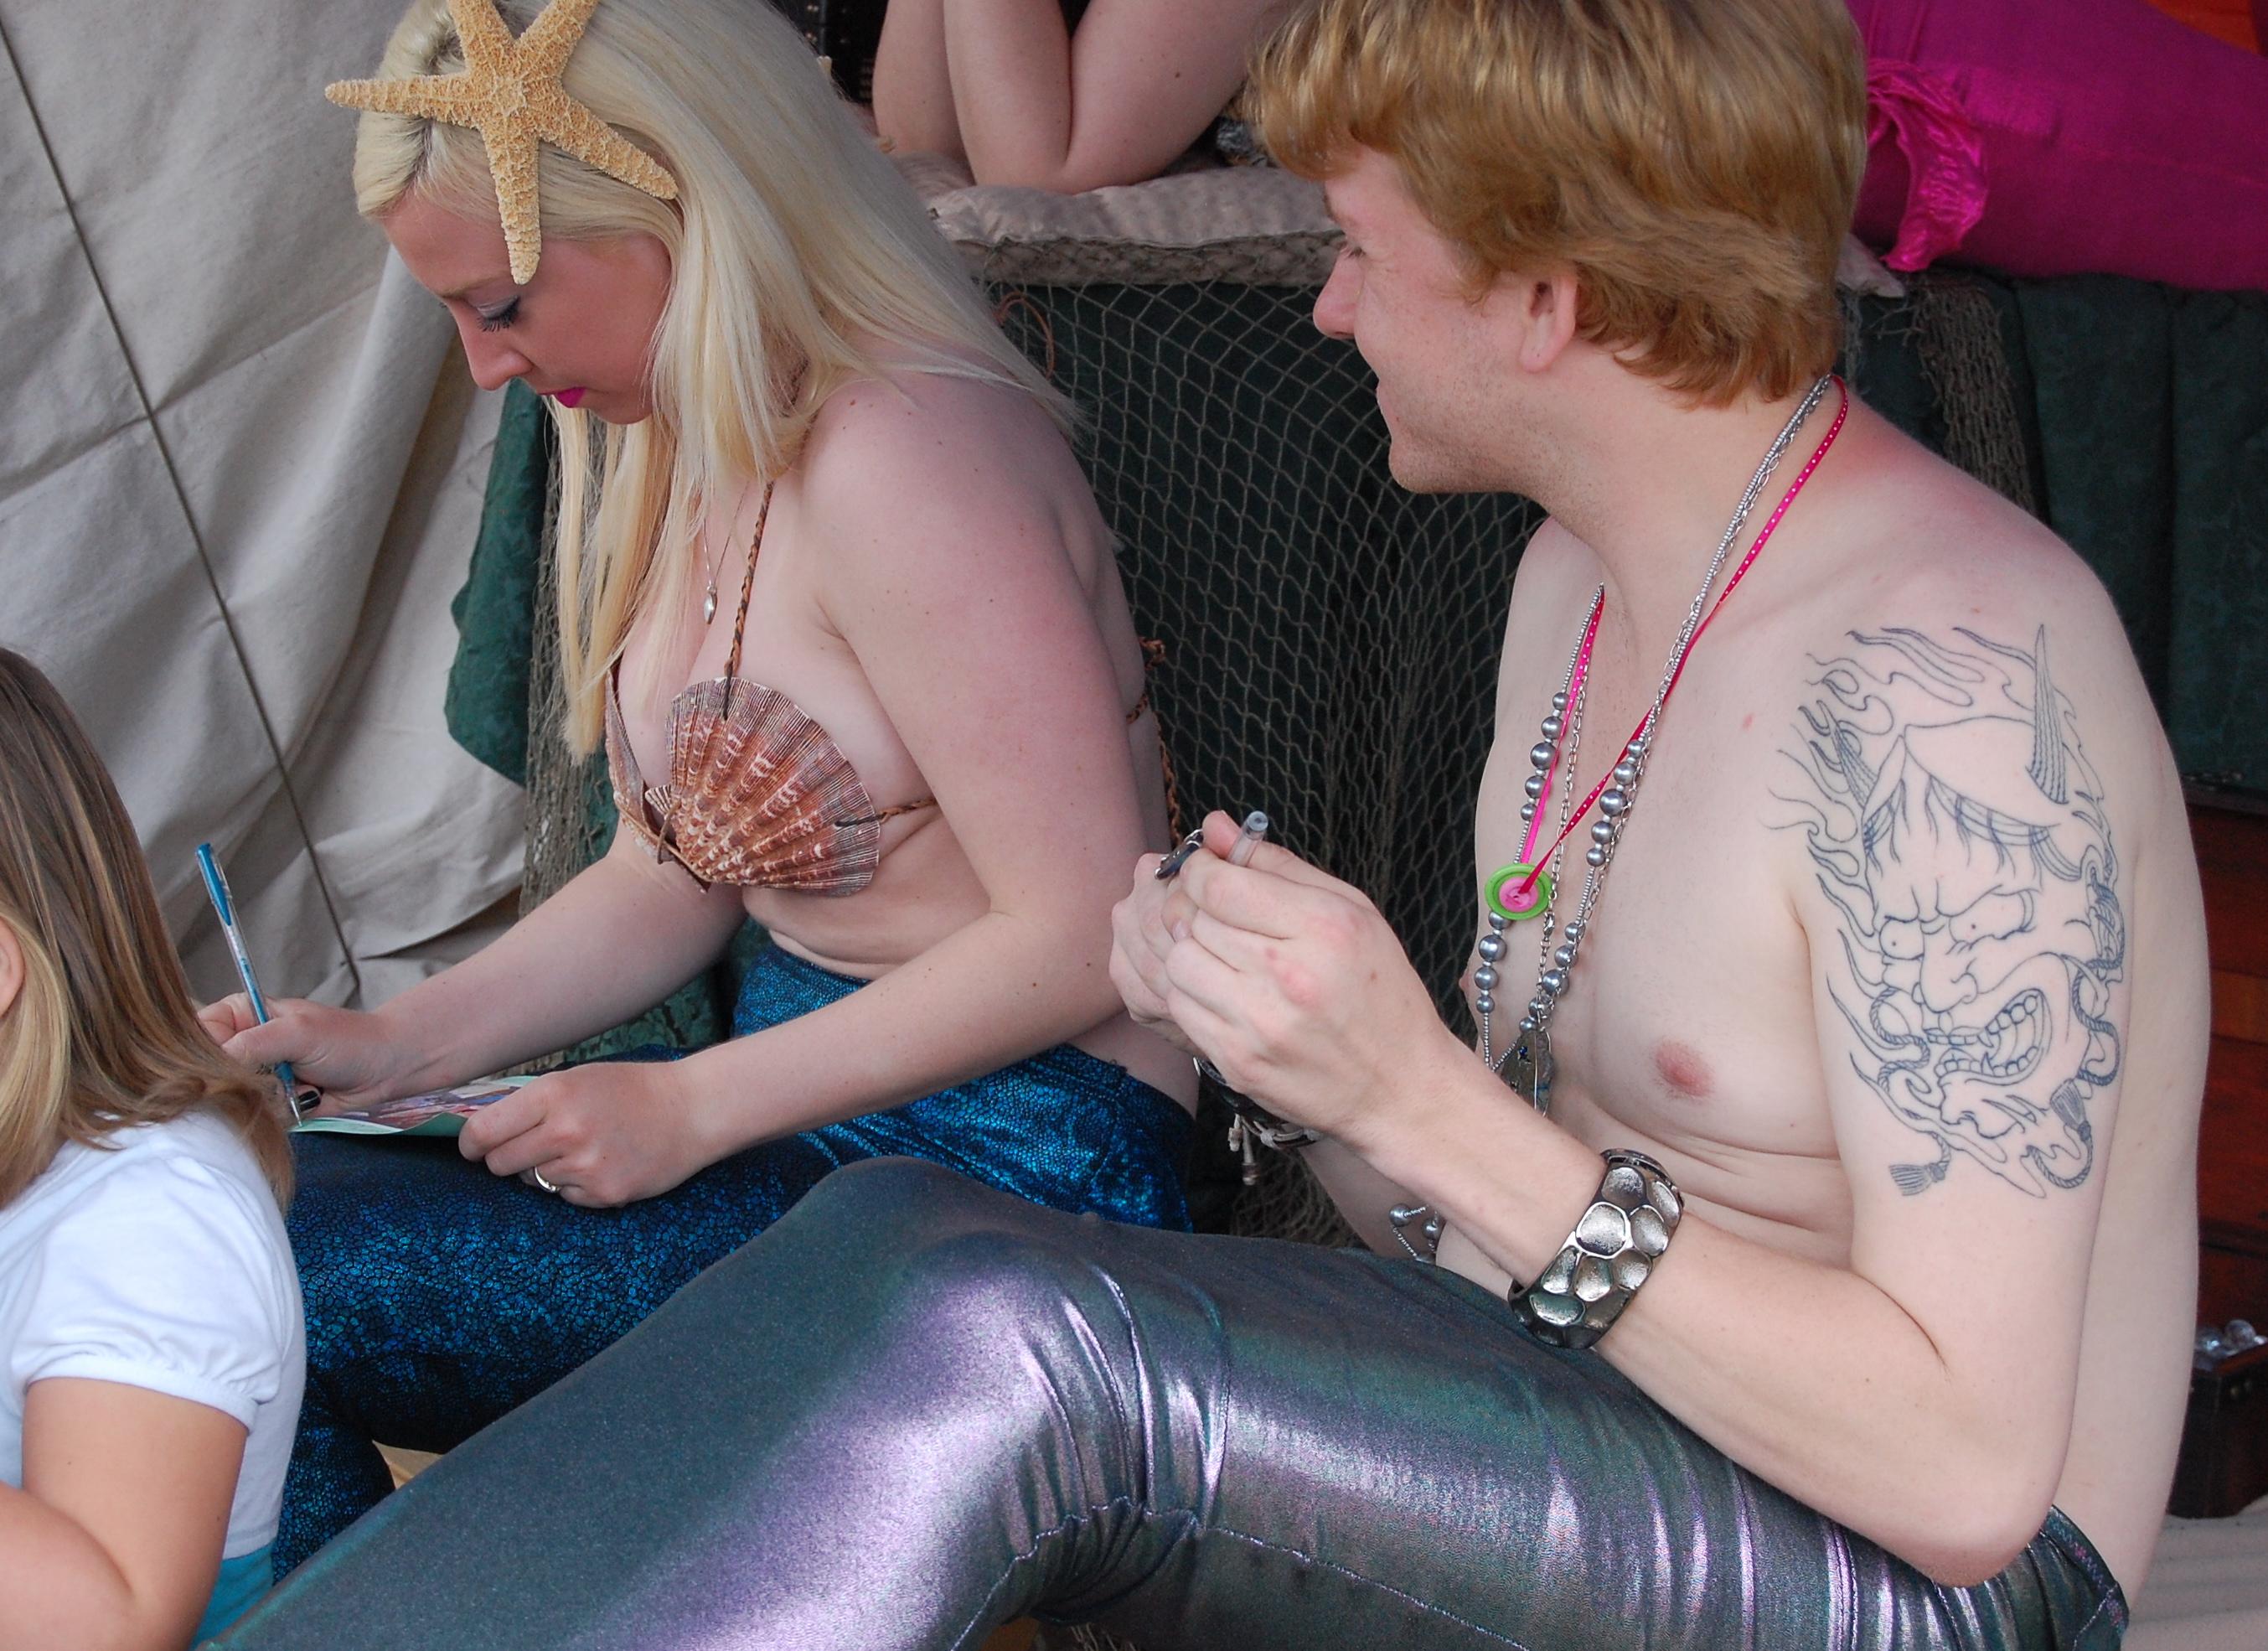 Renaissance mermaids